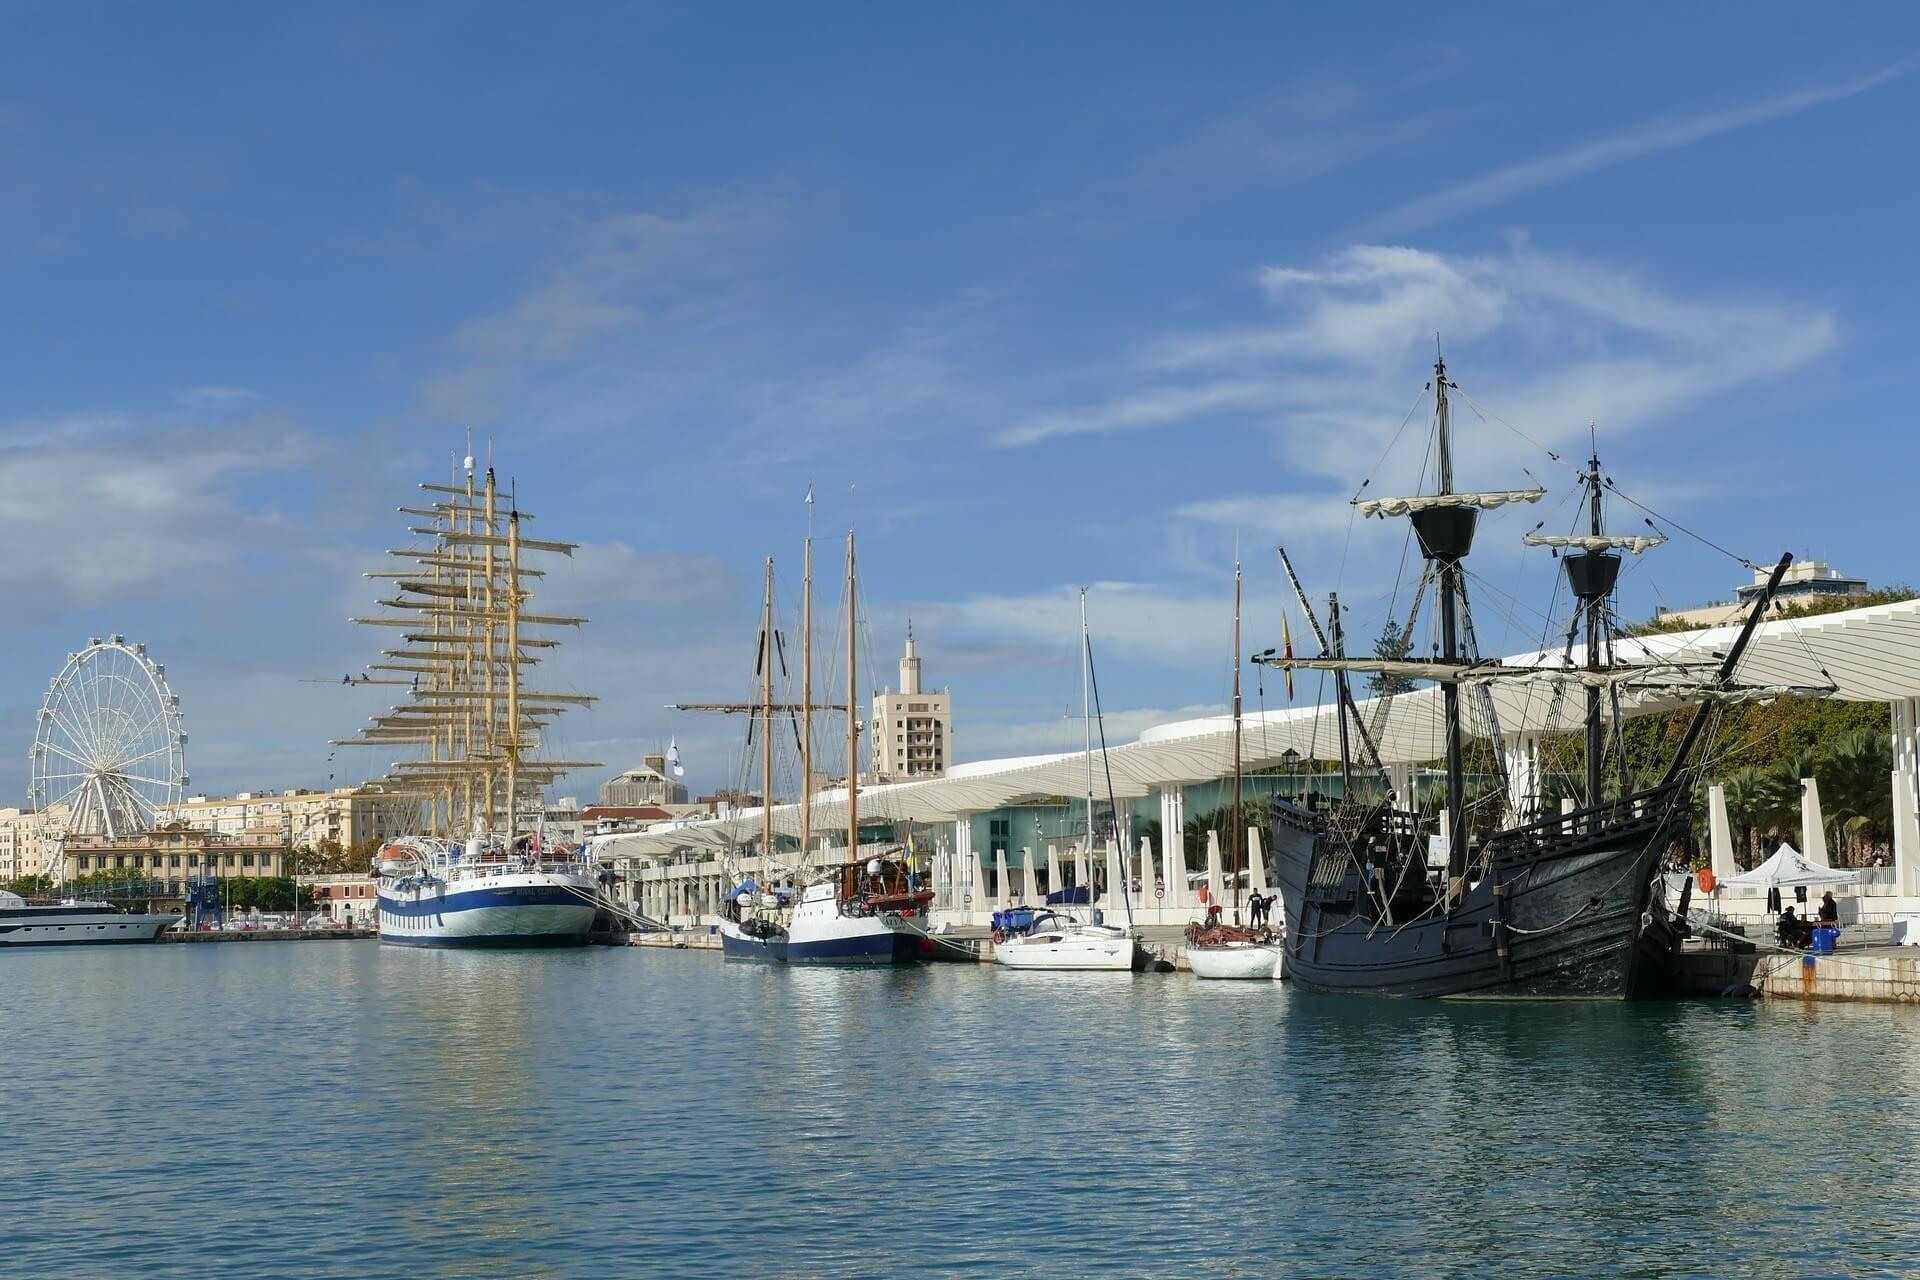 Malaga Port in Spain, visit Malaga